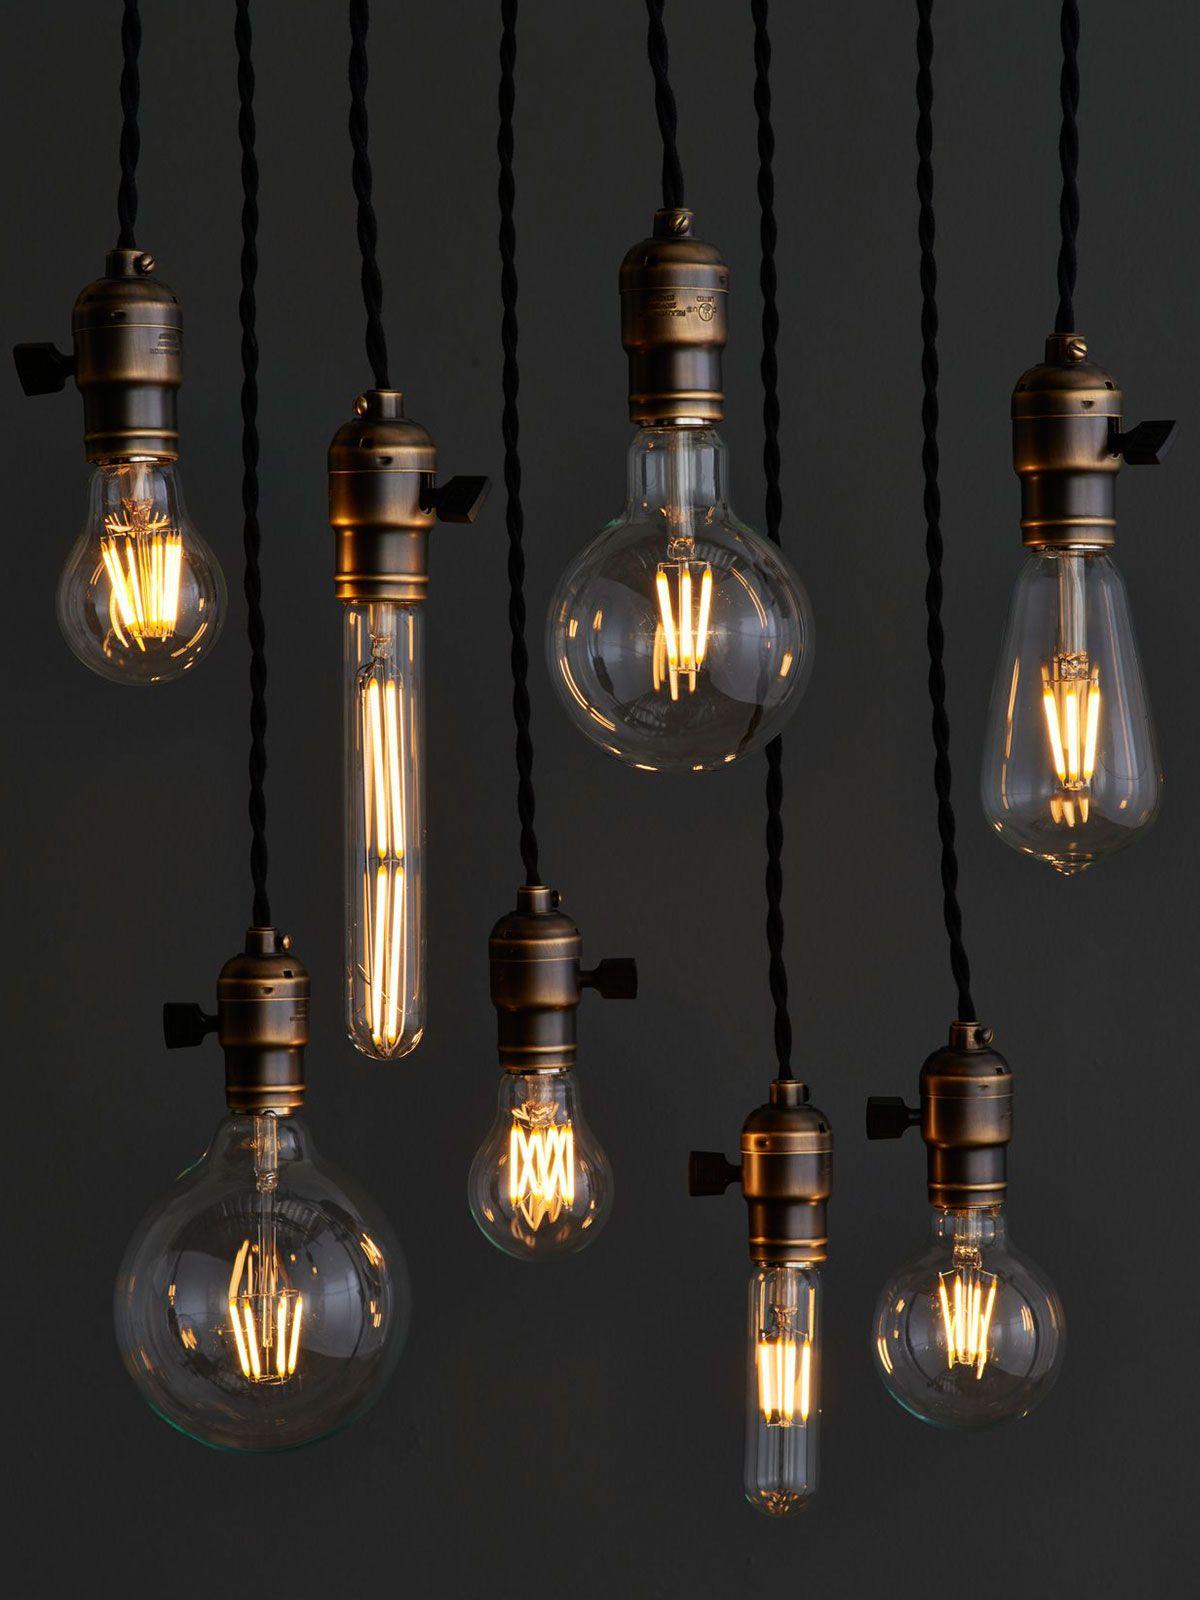 From Carbon To Led Filament Bulbs Vintage Light Bulbs Bare Bulb Lighting Led Light Installation